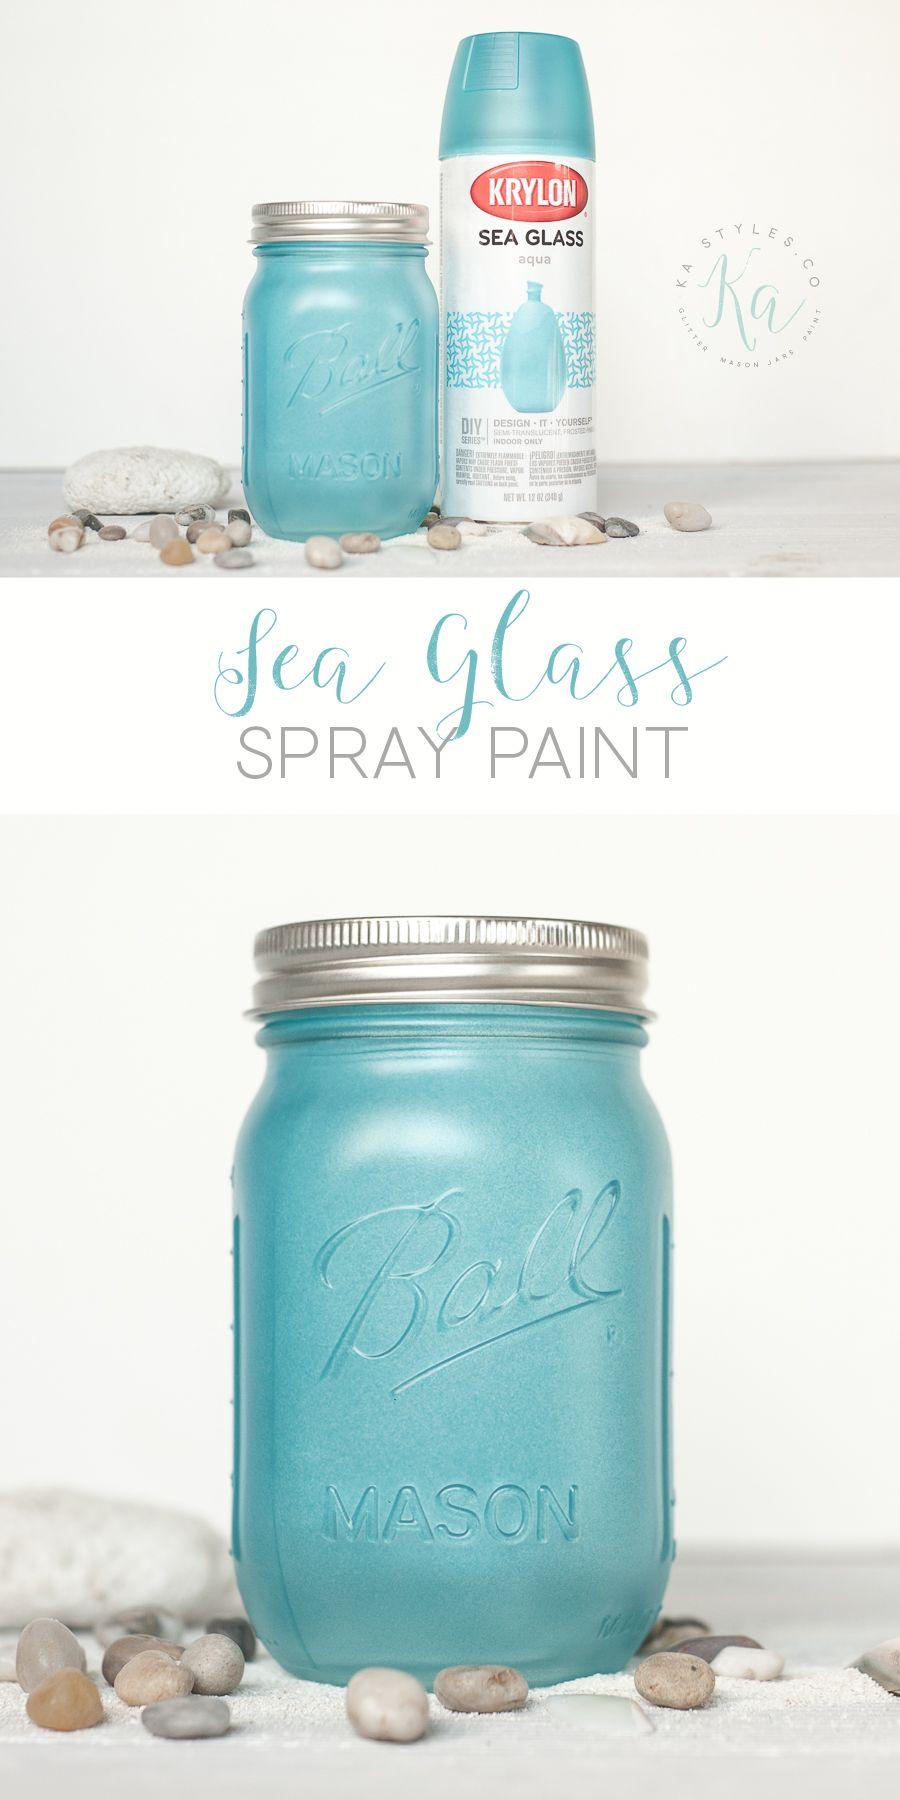 Krylon Aqua Sea Glass Spray Paint - Sprinkled and Painted at KA Styles.co